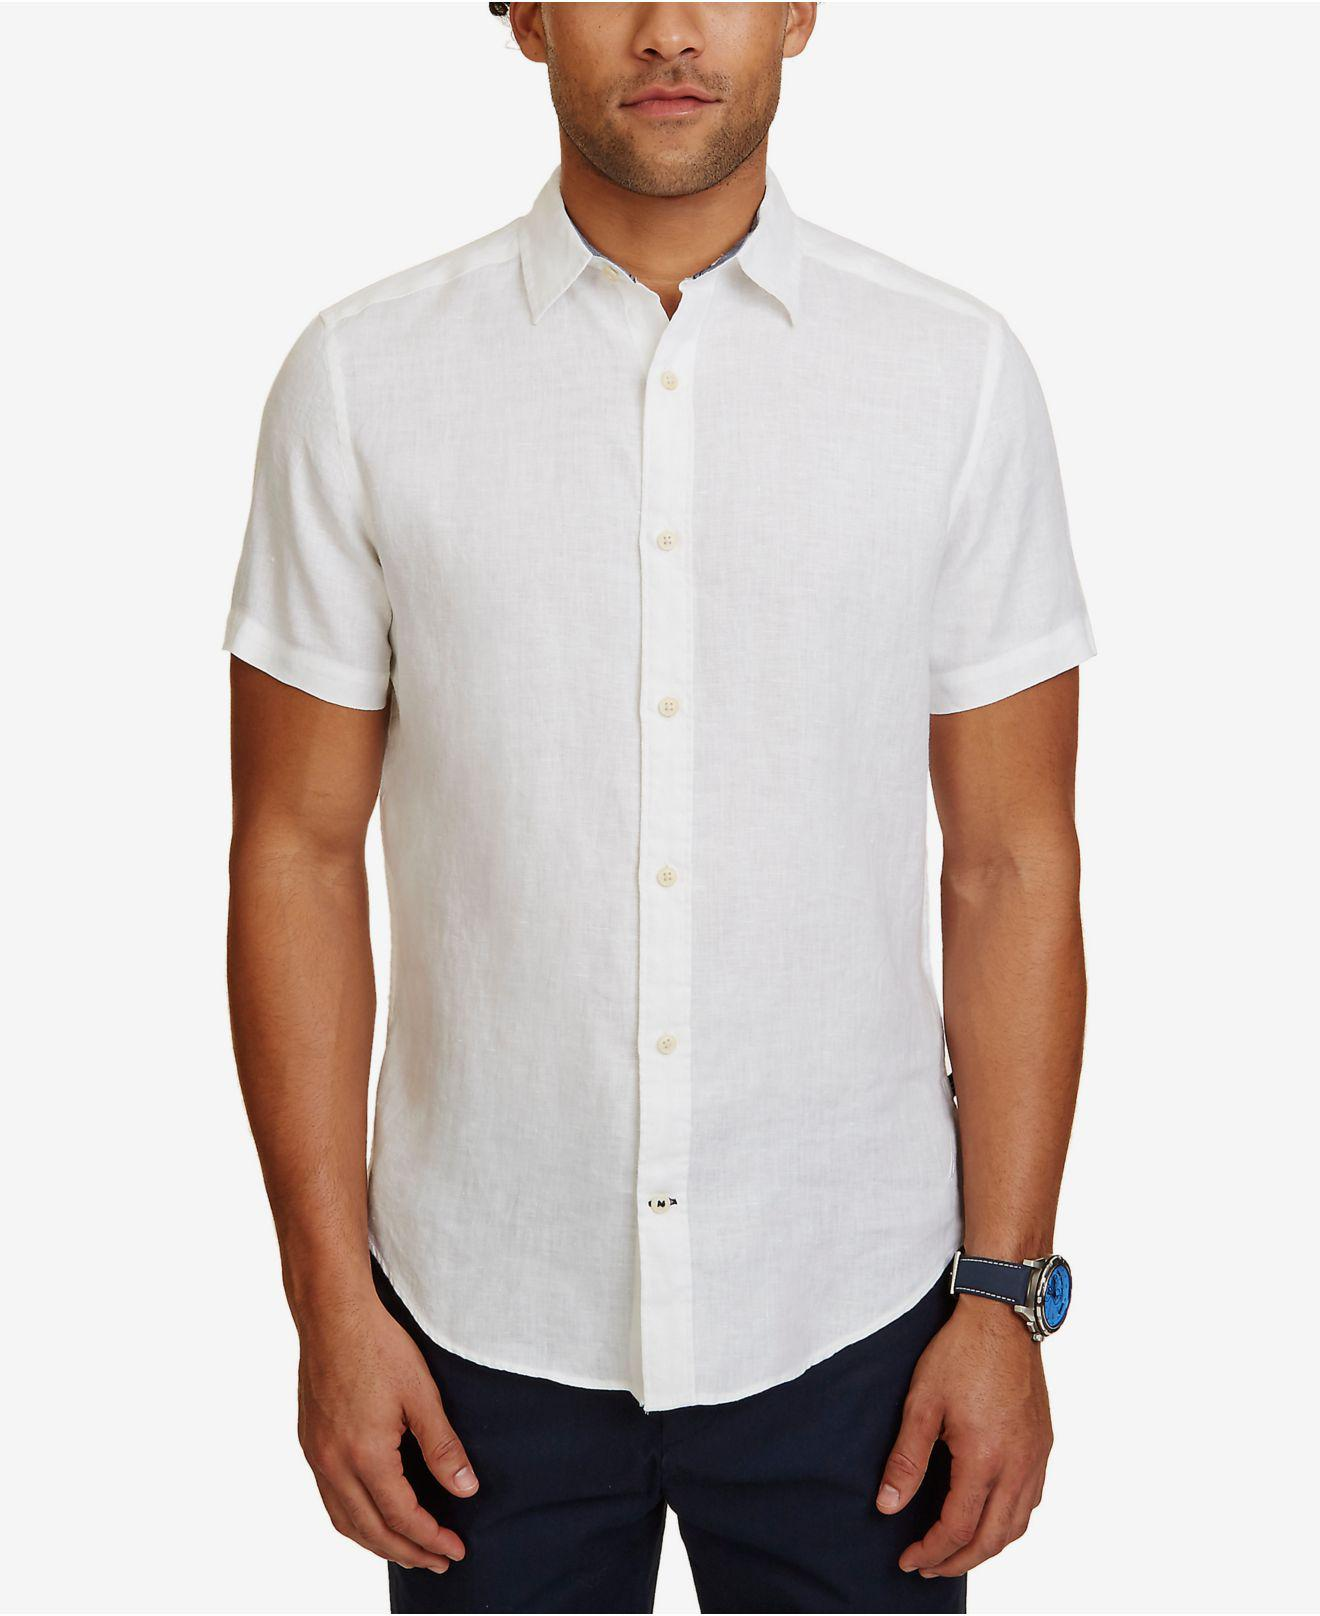 Nautica Long Sleeve Floral Linen Woven Shirt Cheap Sale Best Wholesale gT6jbMGe3